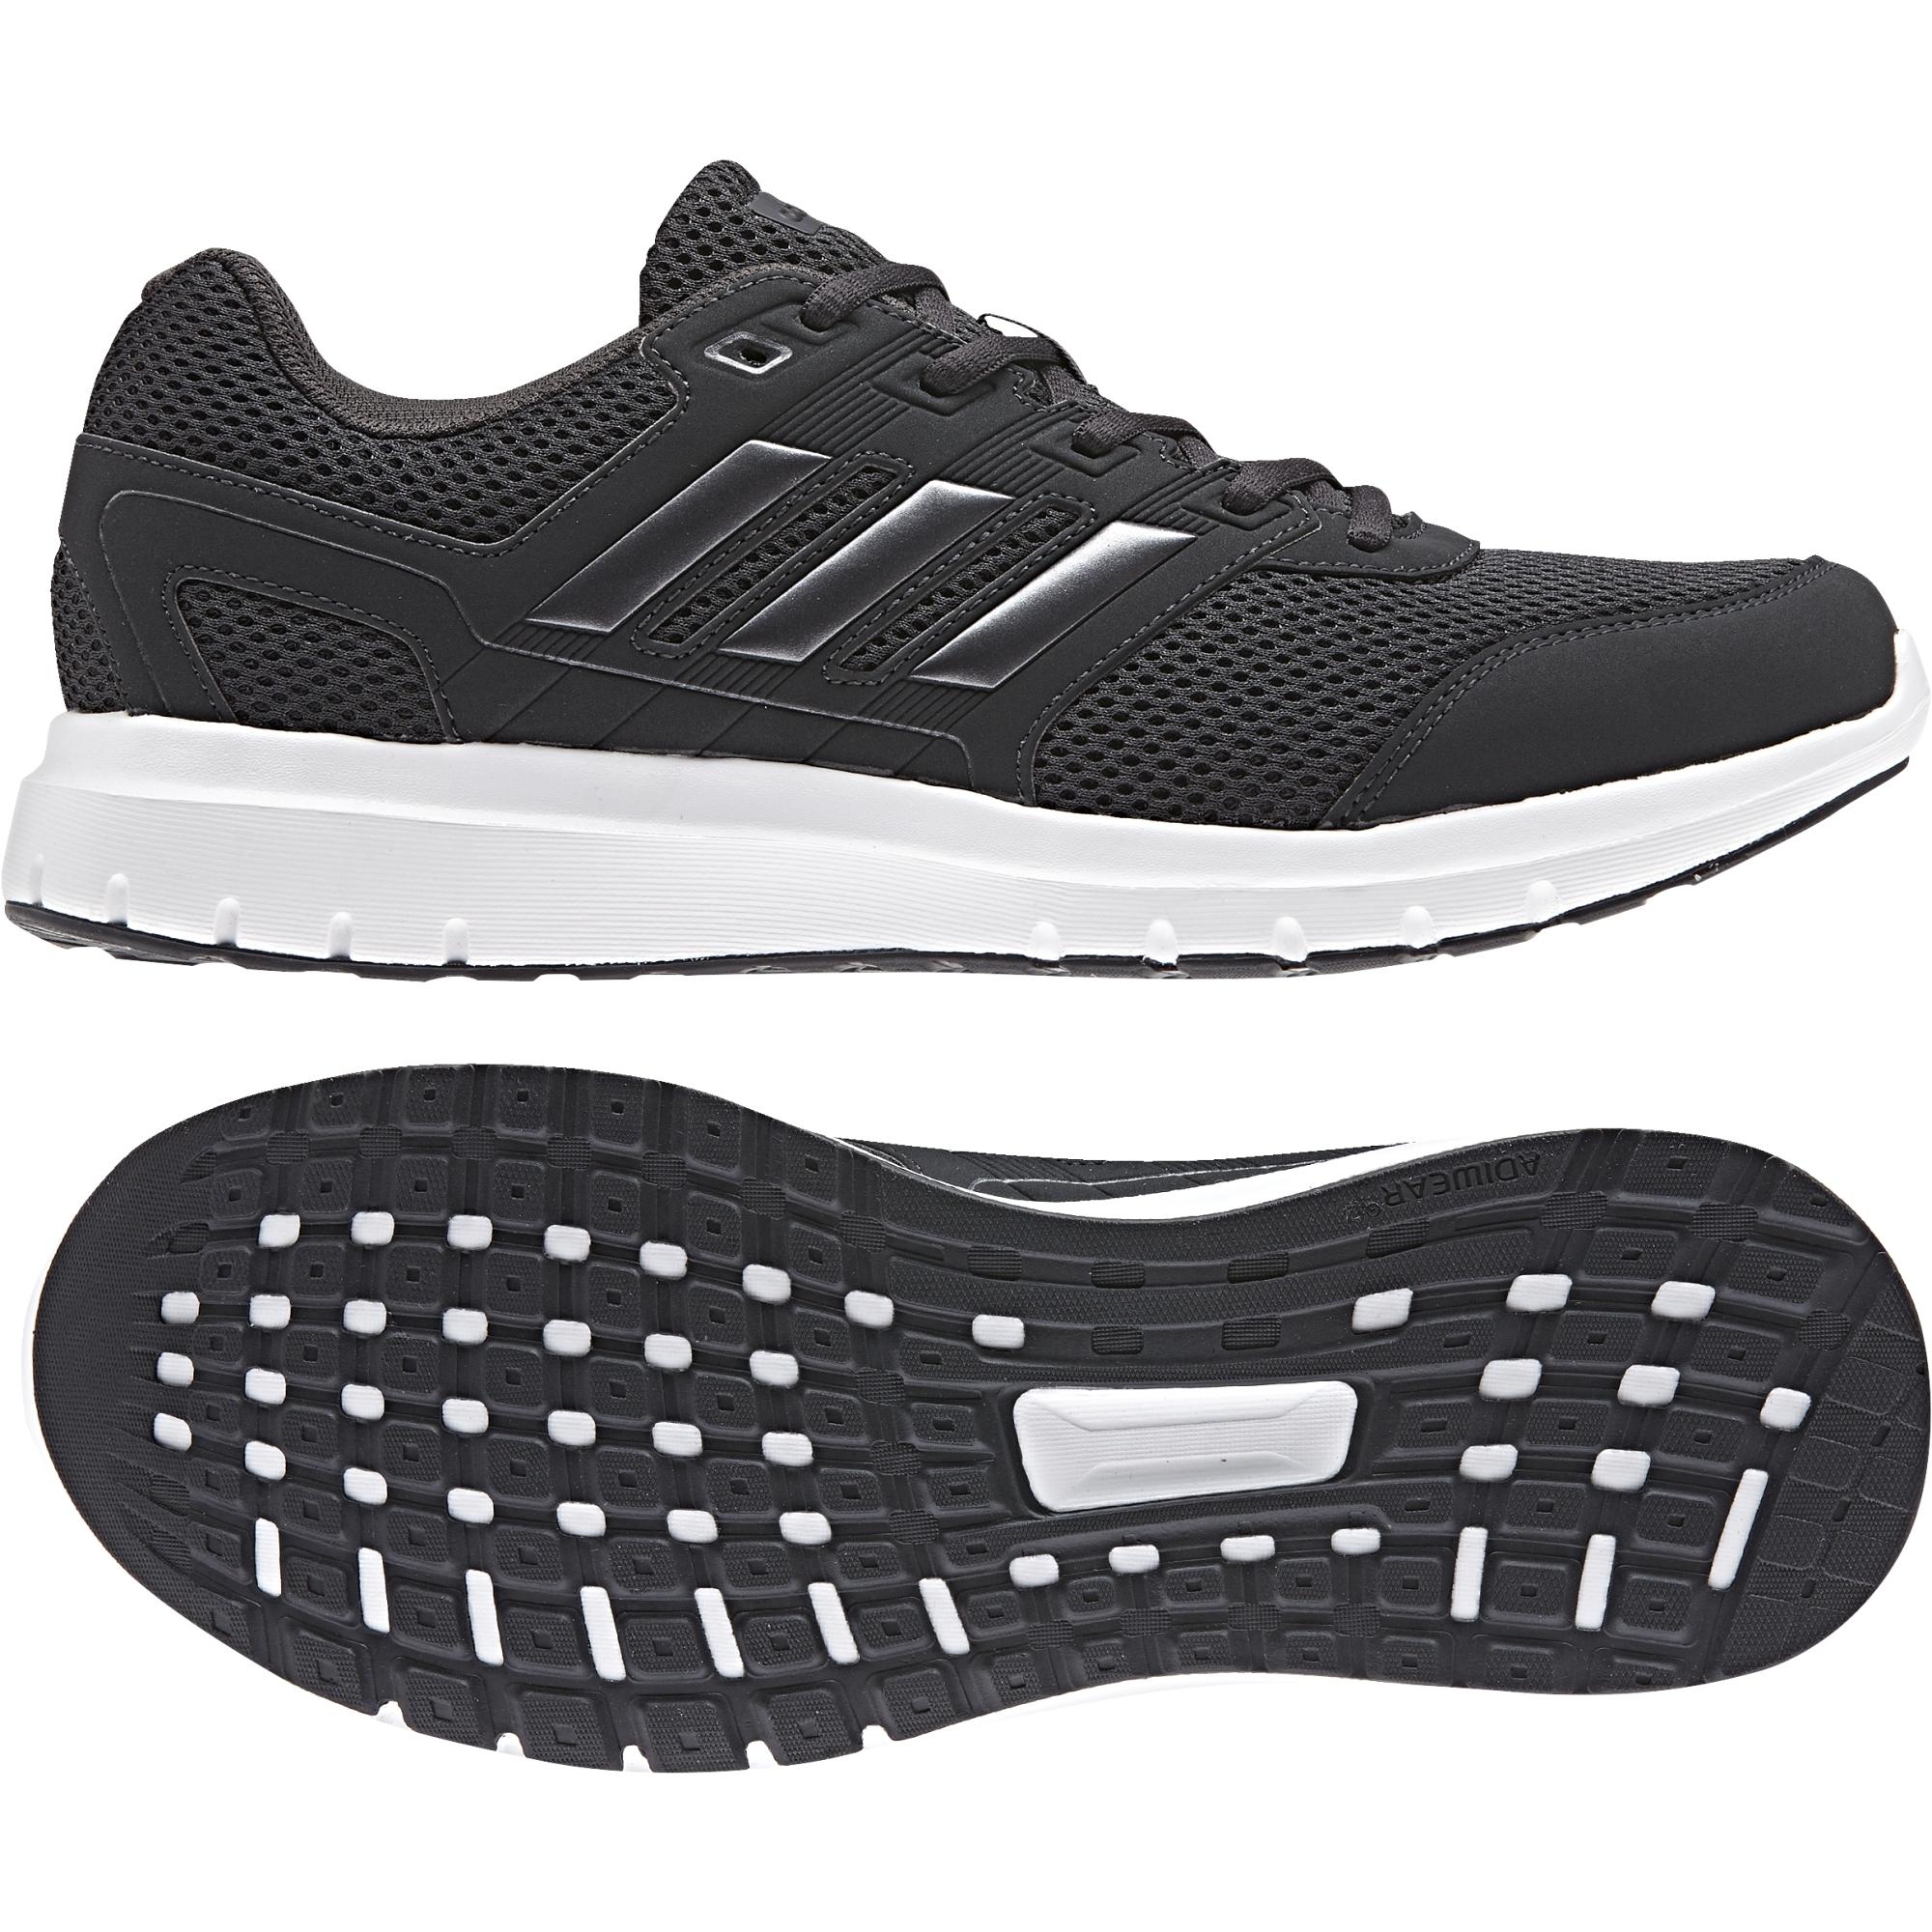 online store 3e343 8a71a Chaussures adidas Duramo Lite 2.0